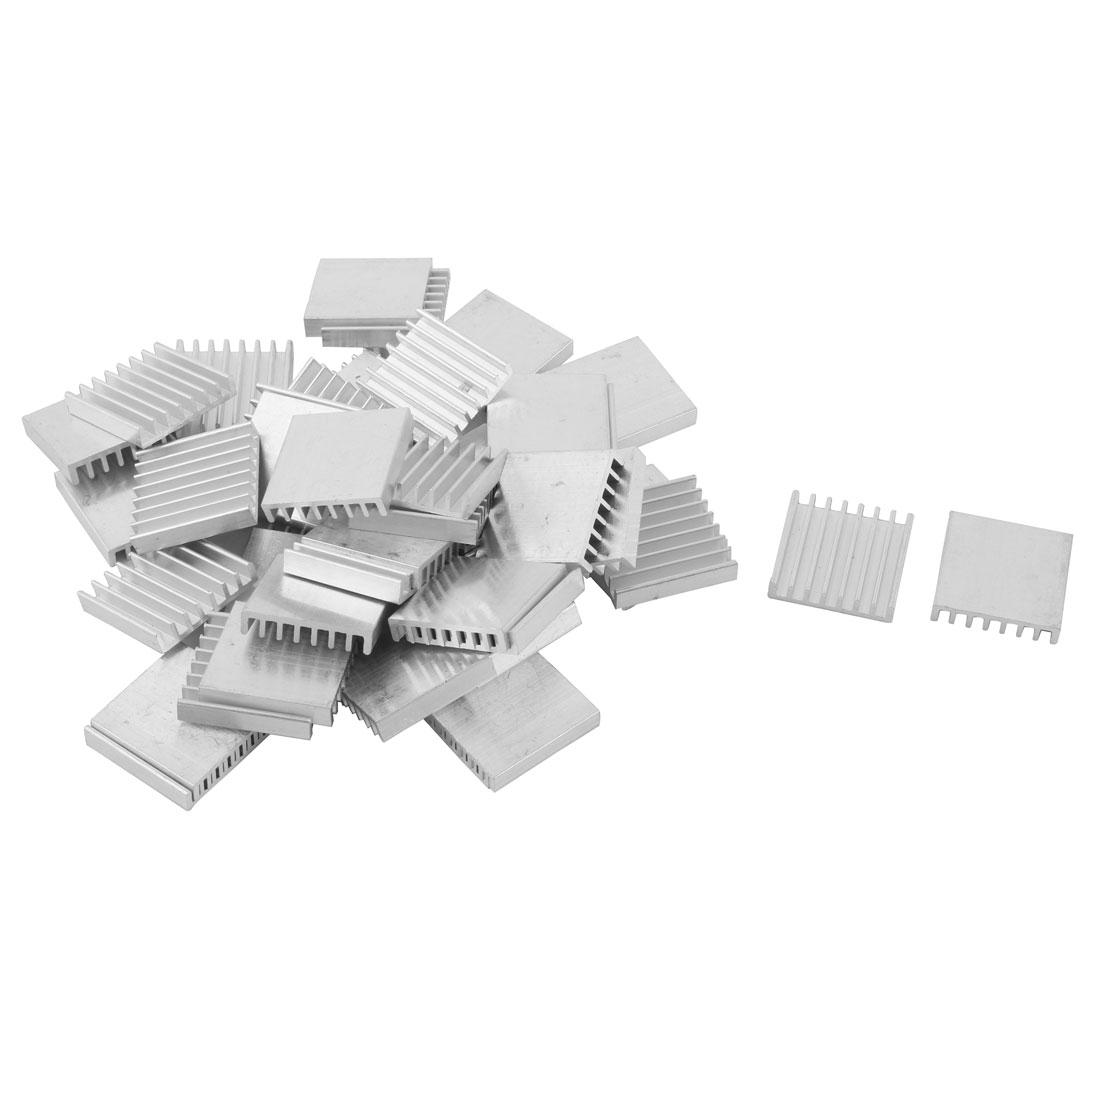 Aluminium Heats Dissipate Cooling Fin Cooler Silver Tone 25mm x 25mm x 5mm 45pcs